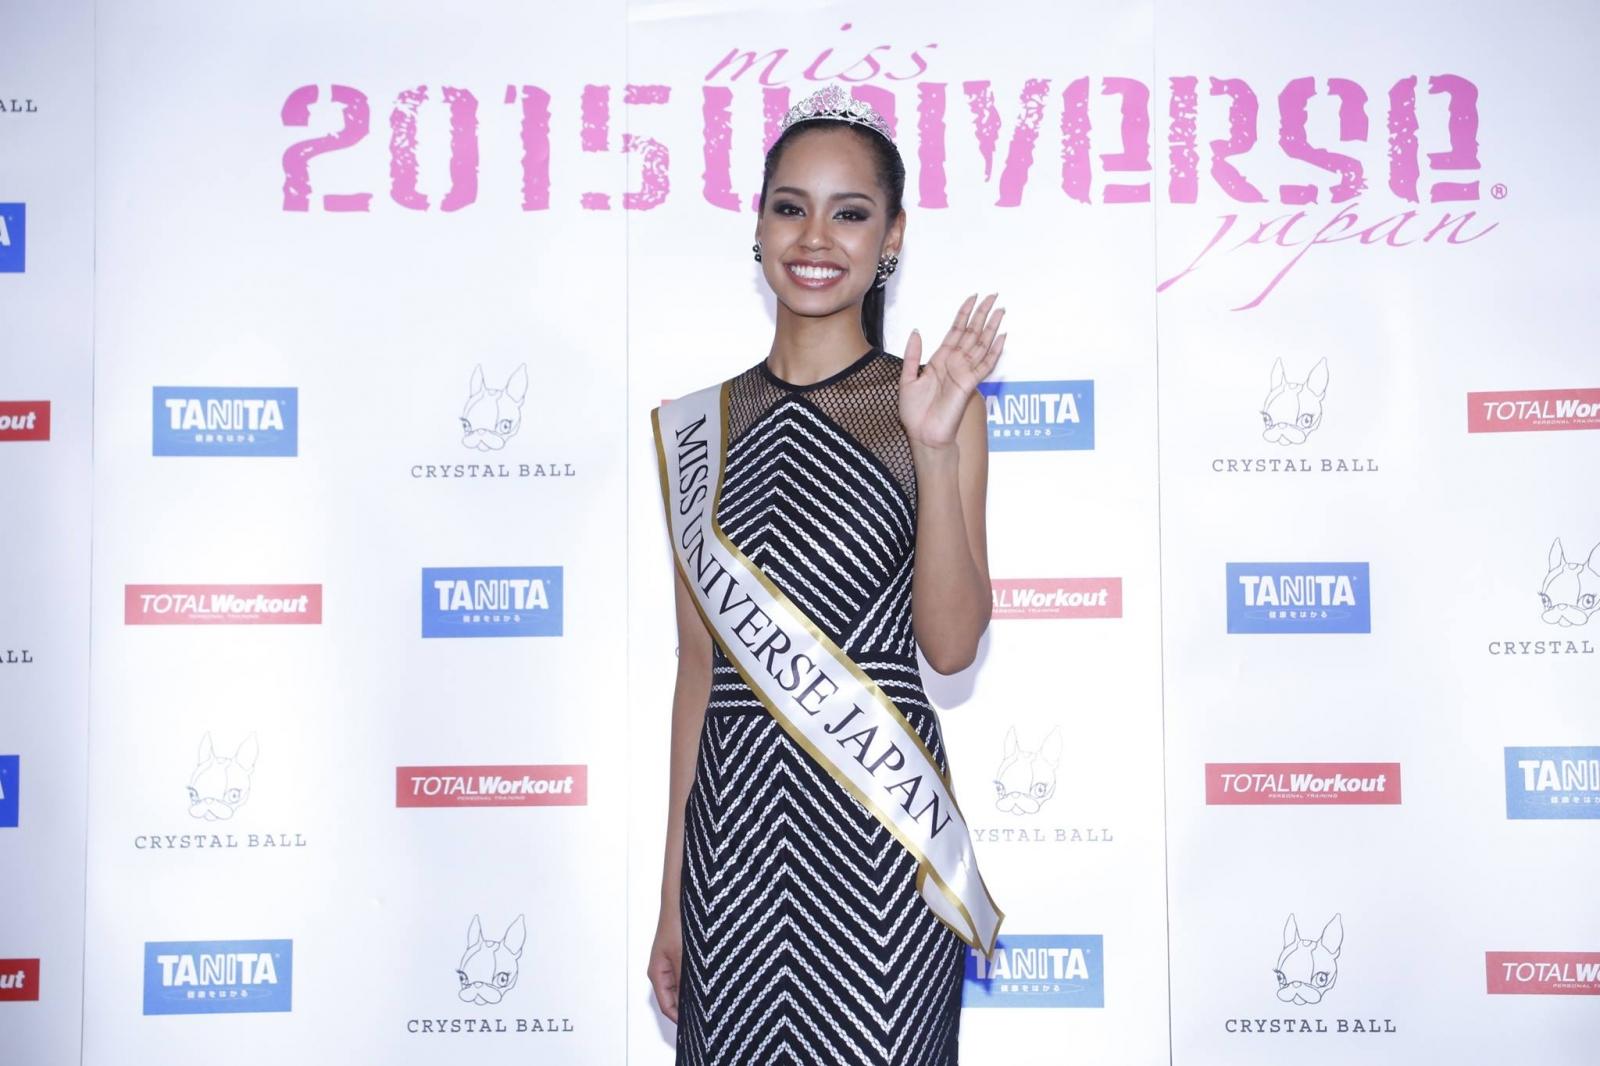 Miss Universe Japan Ariana Miyamoto